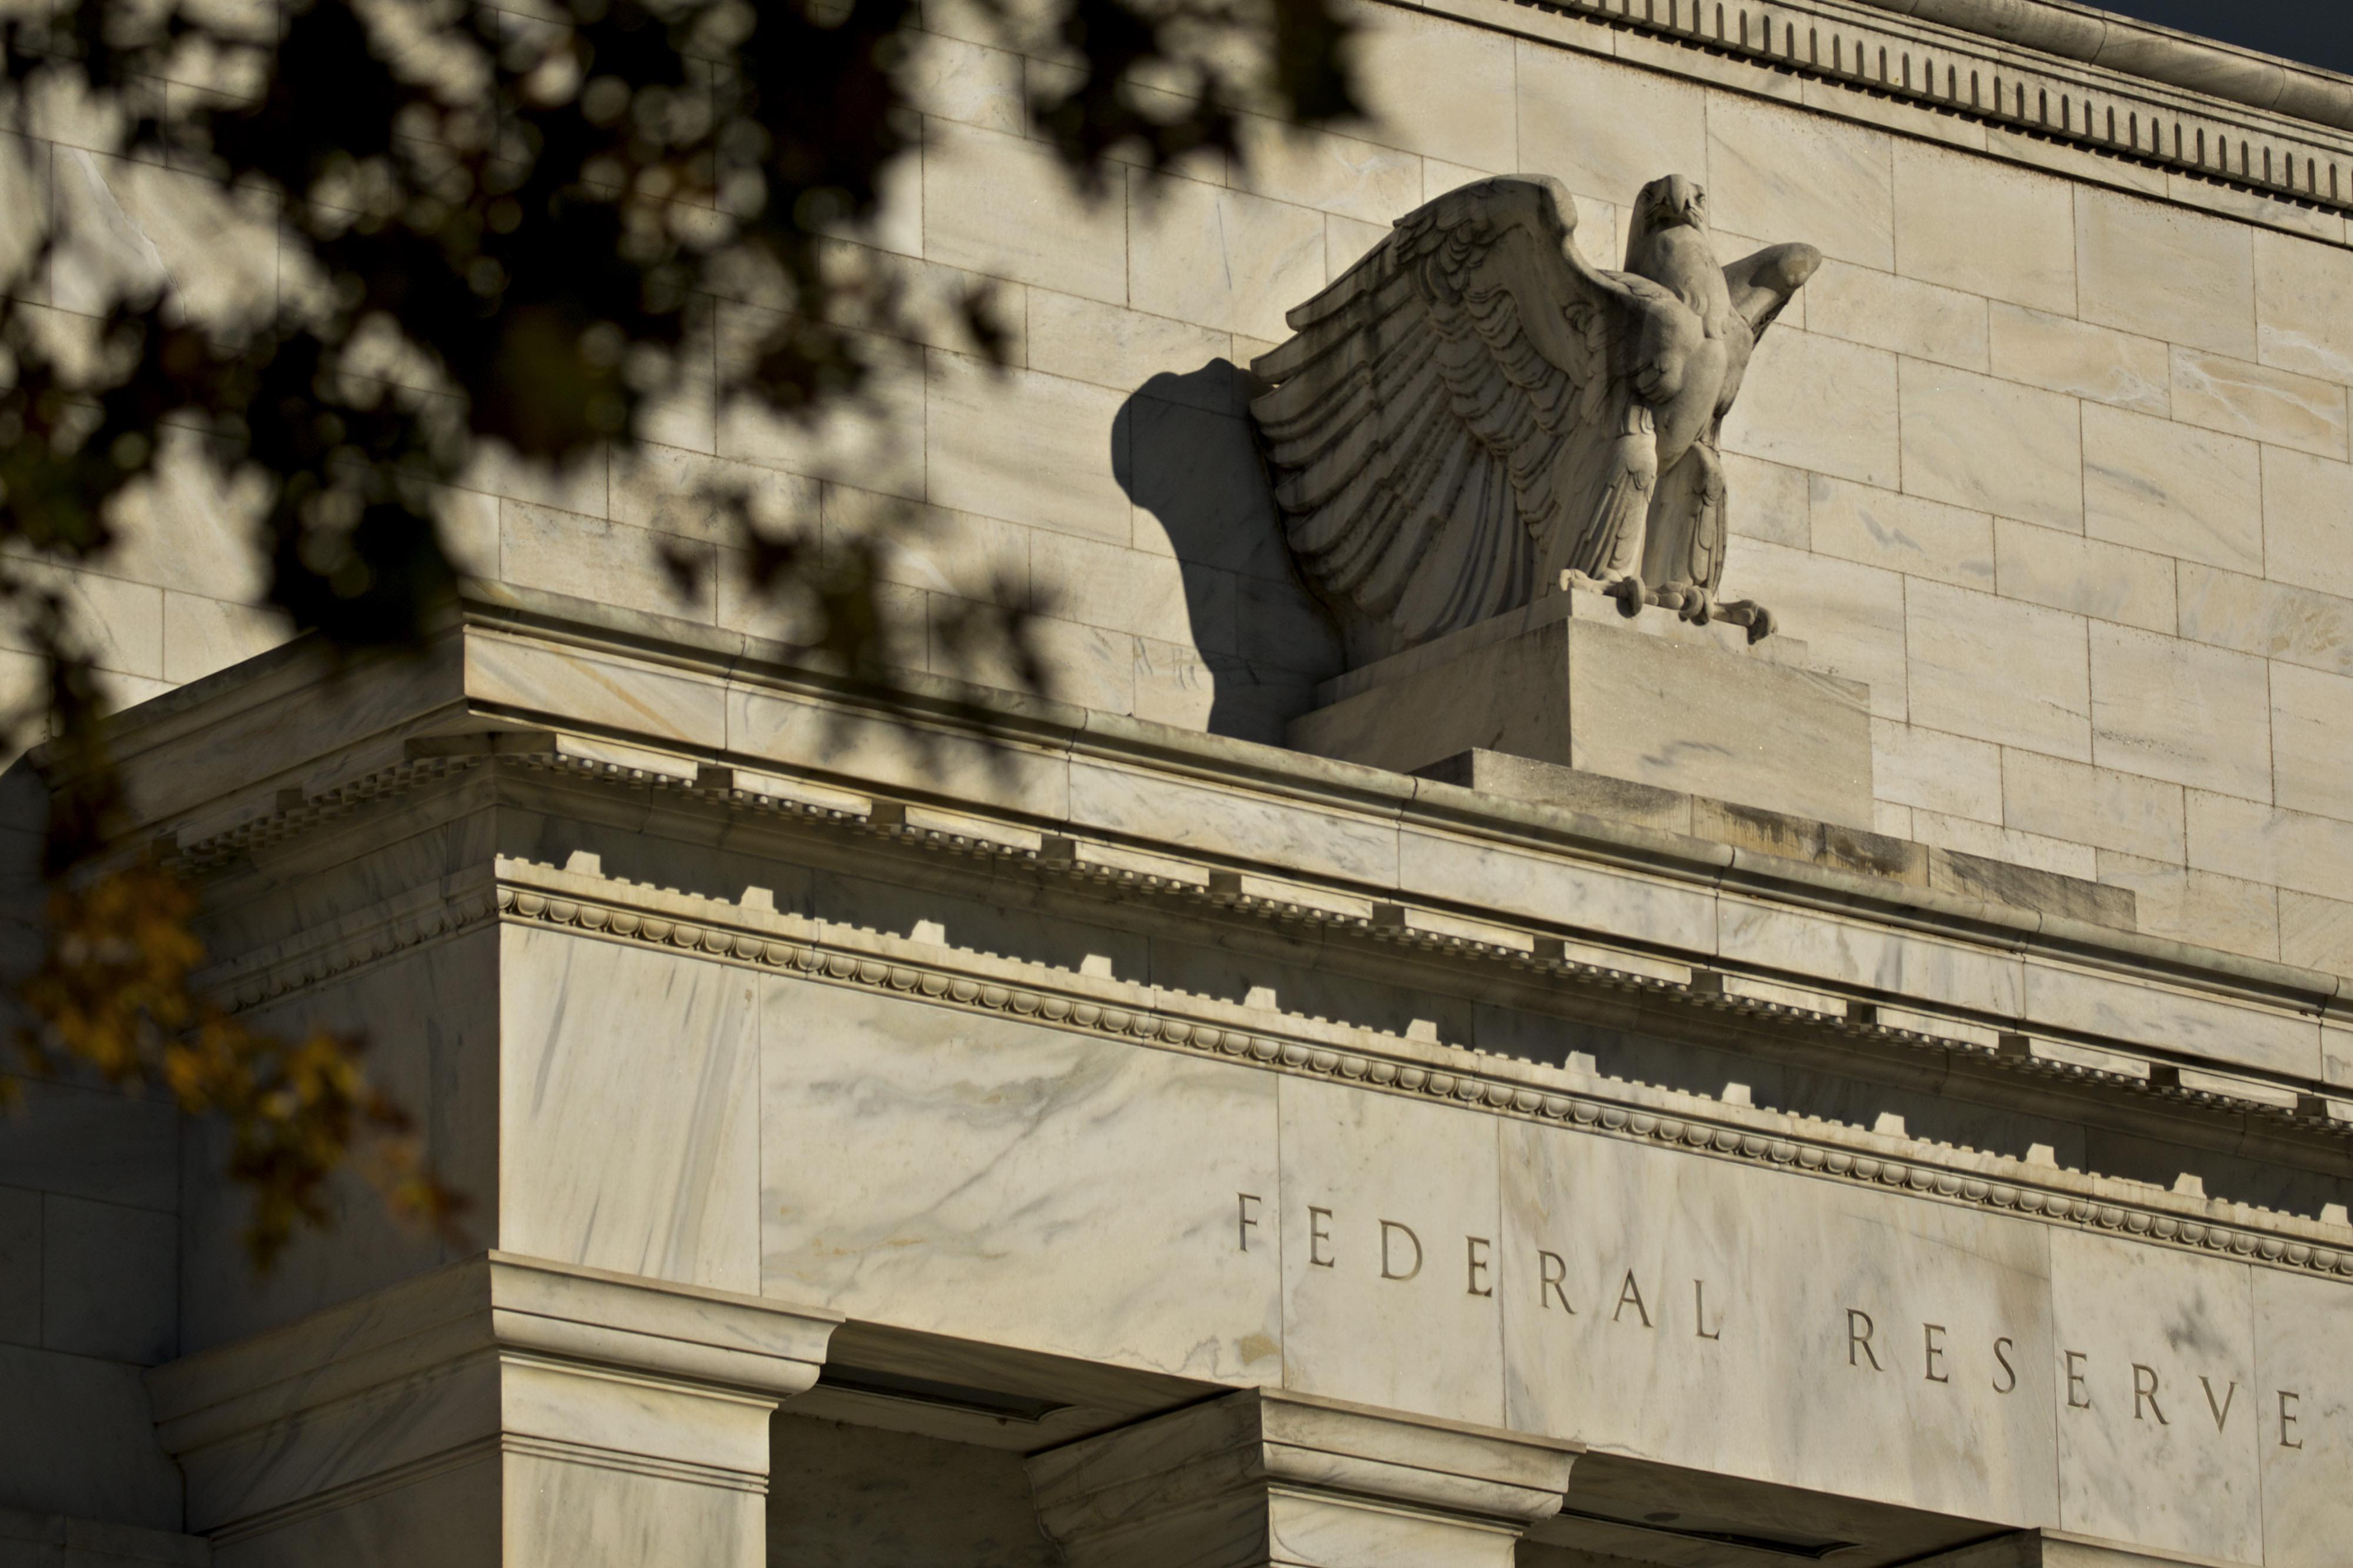 January 2021 – Bond Market Review